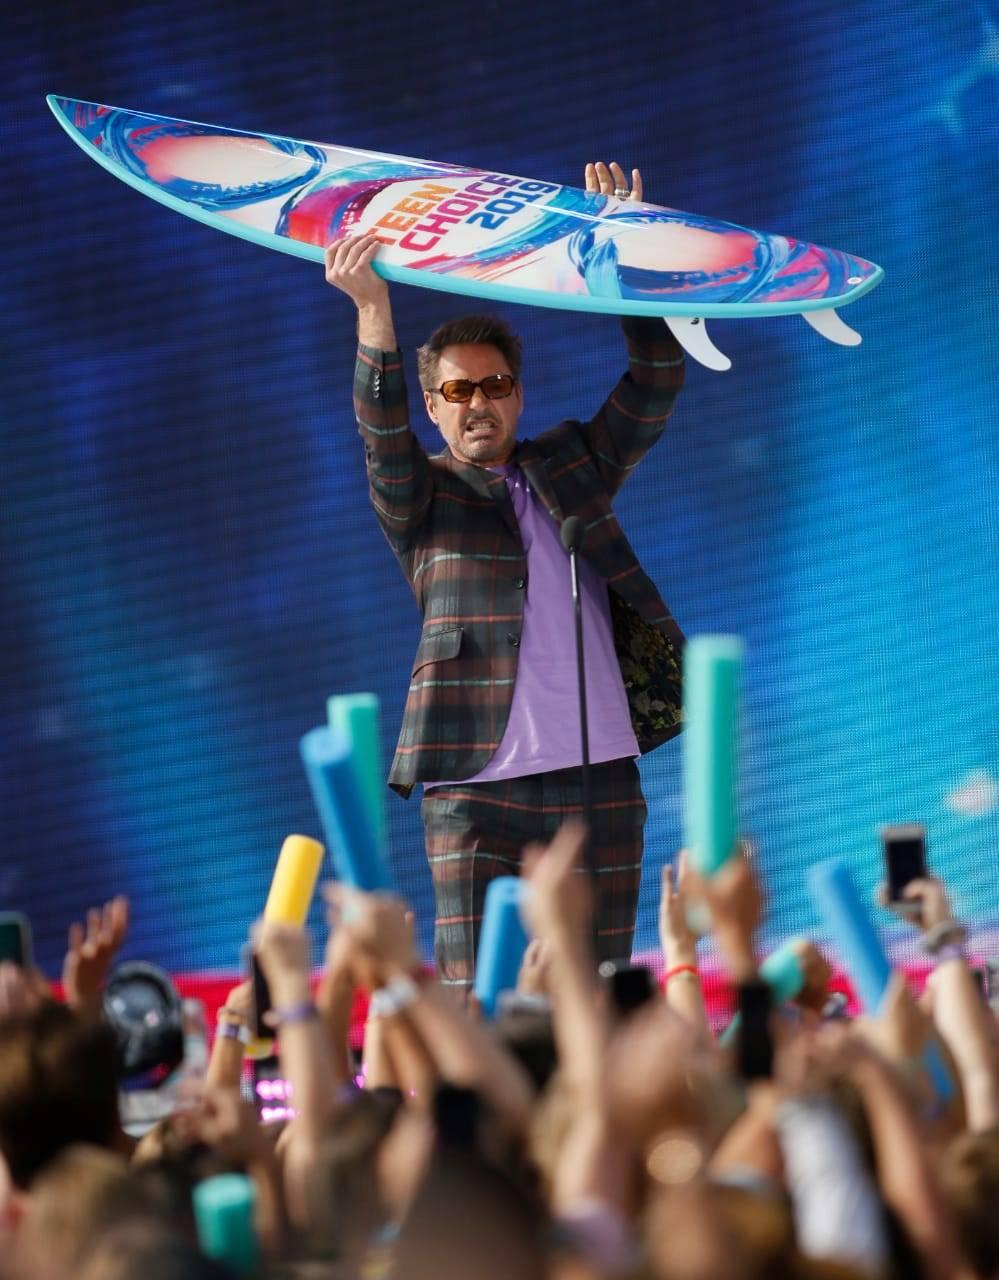 Robert Downey Jr. wins 'Choice Action Movie Actor' - Teen Choice Awards 2019